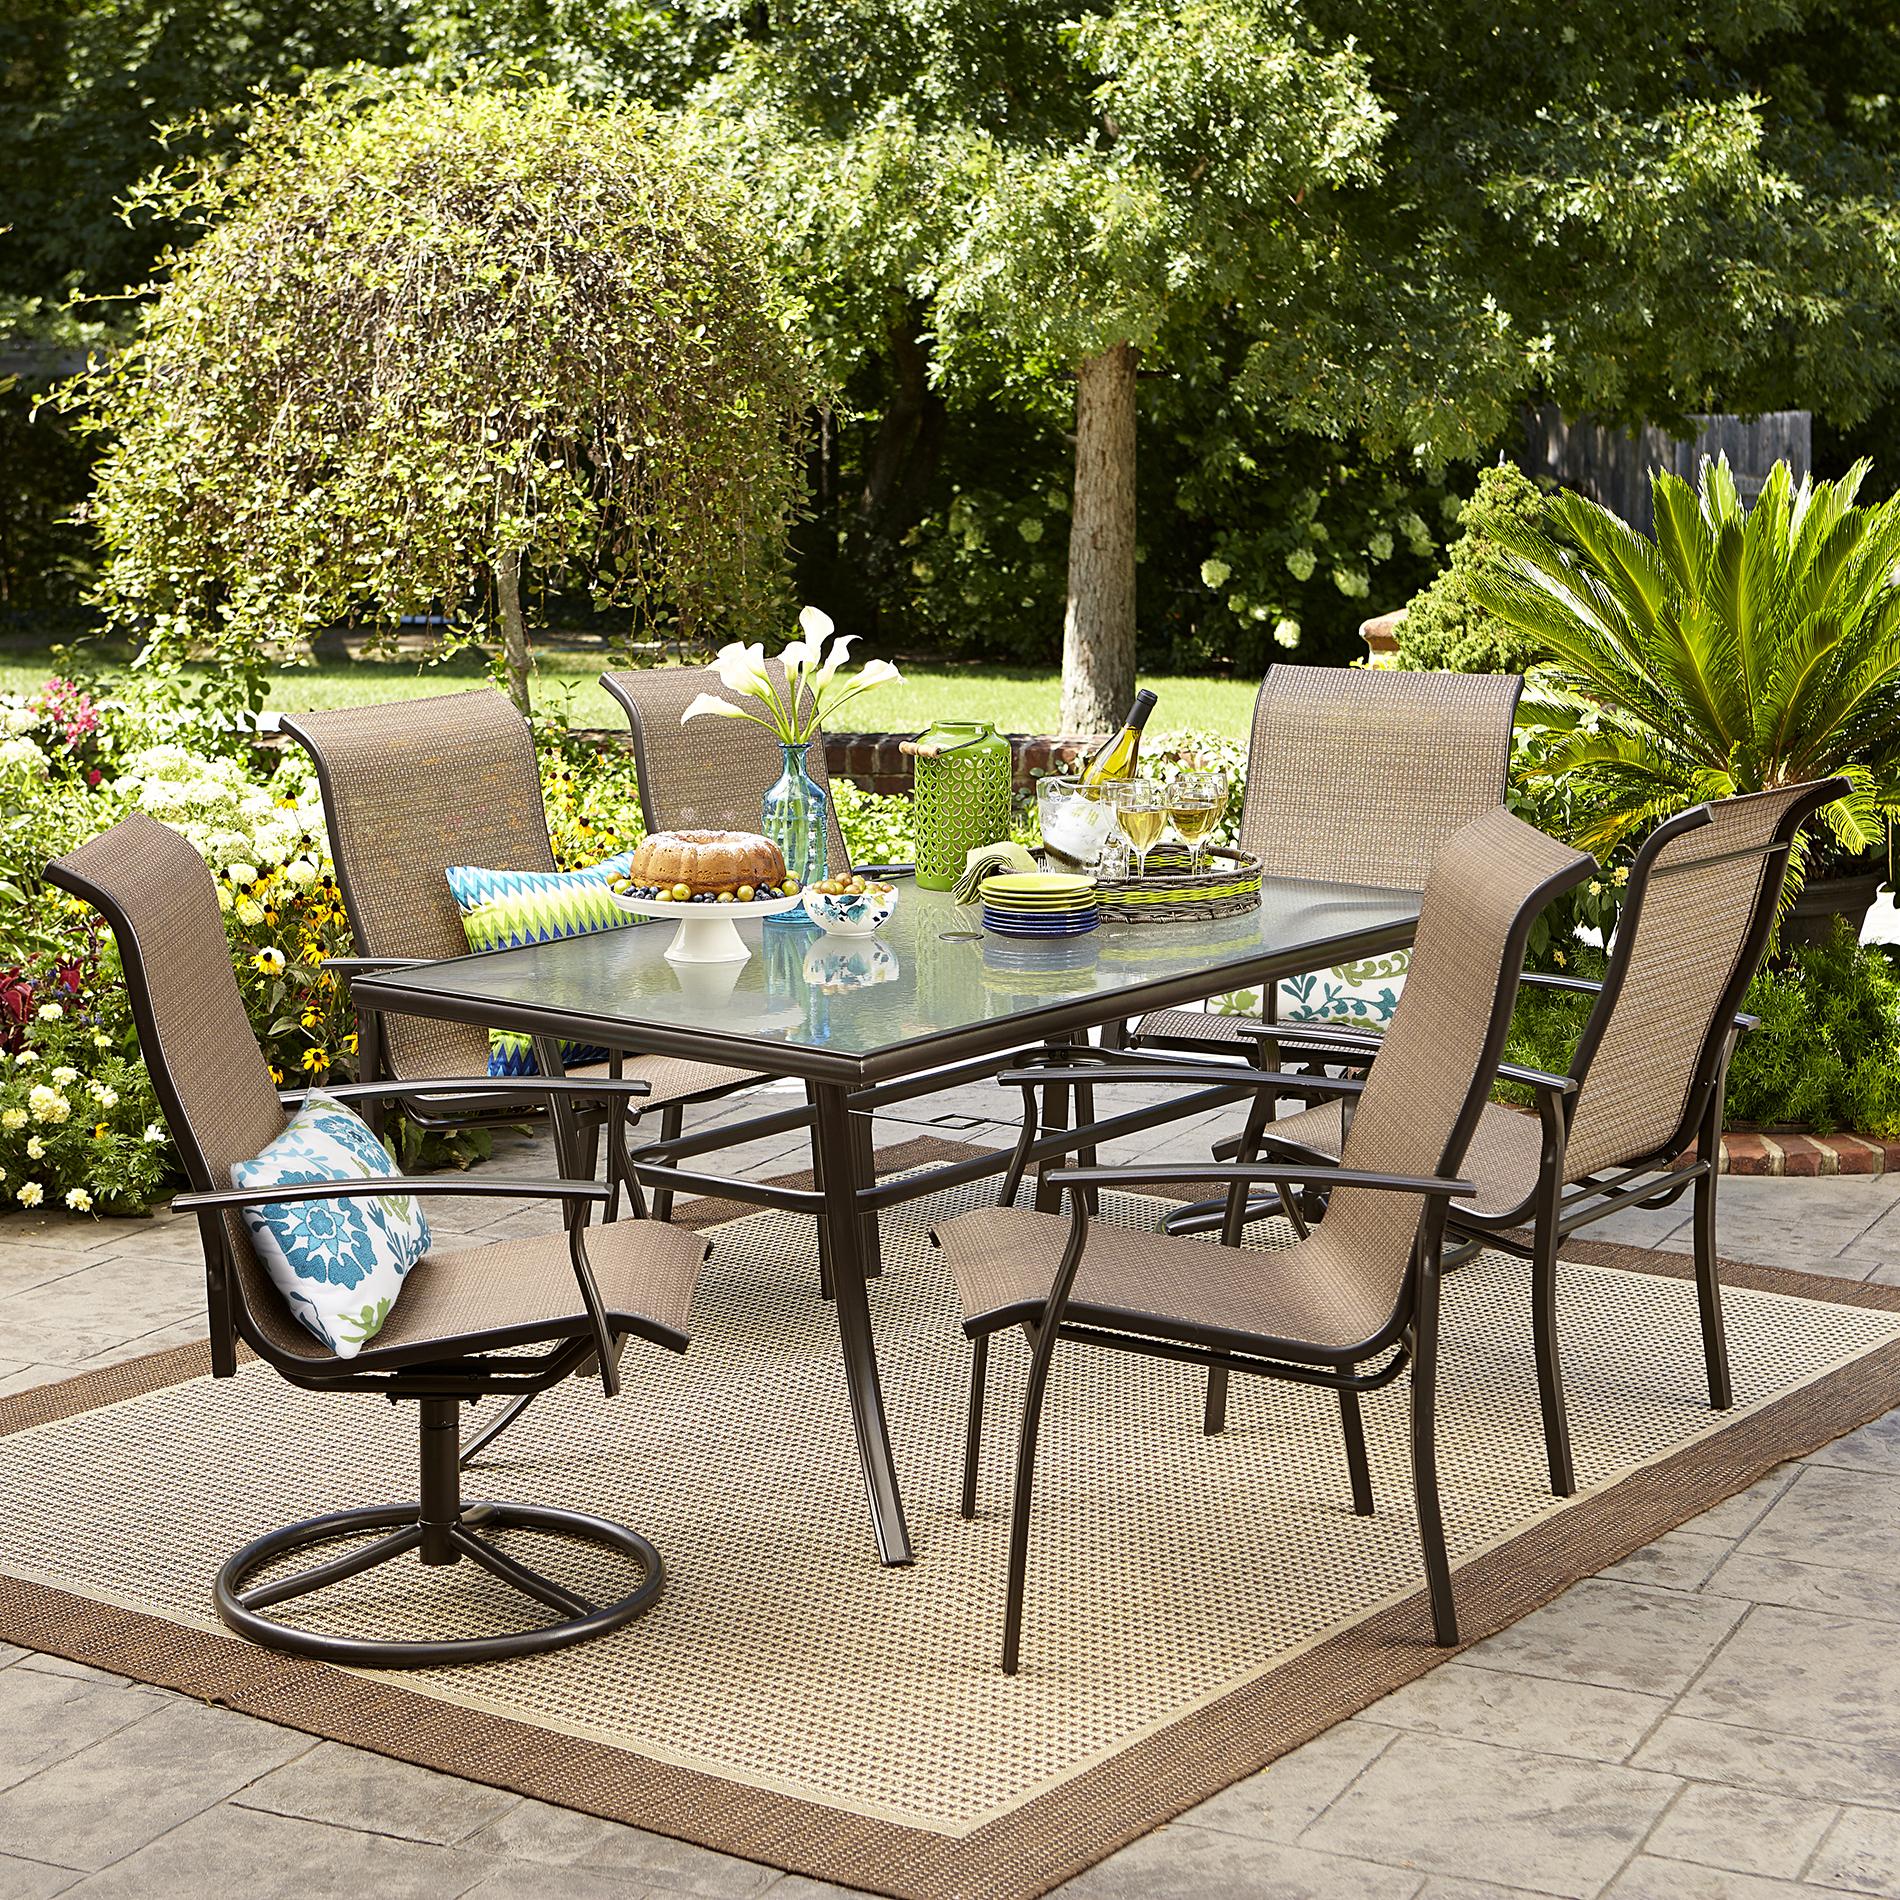 patio dining set garden oasis harrison 7 piece dining set - sears XJNKNDF